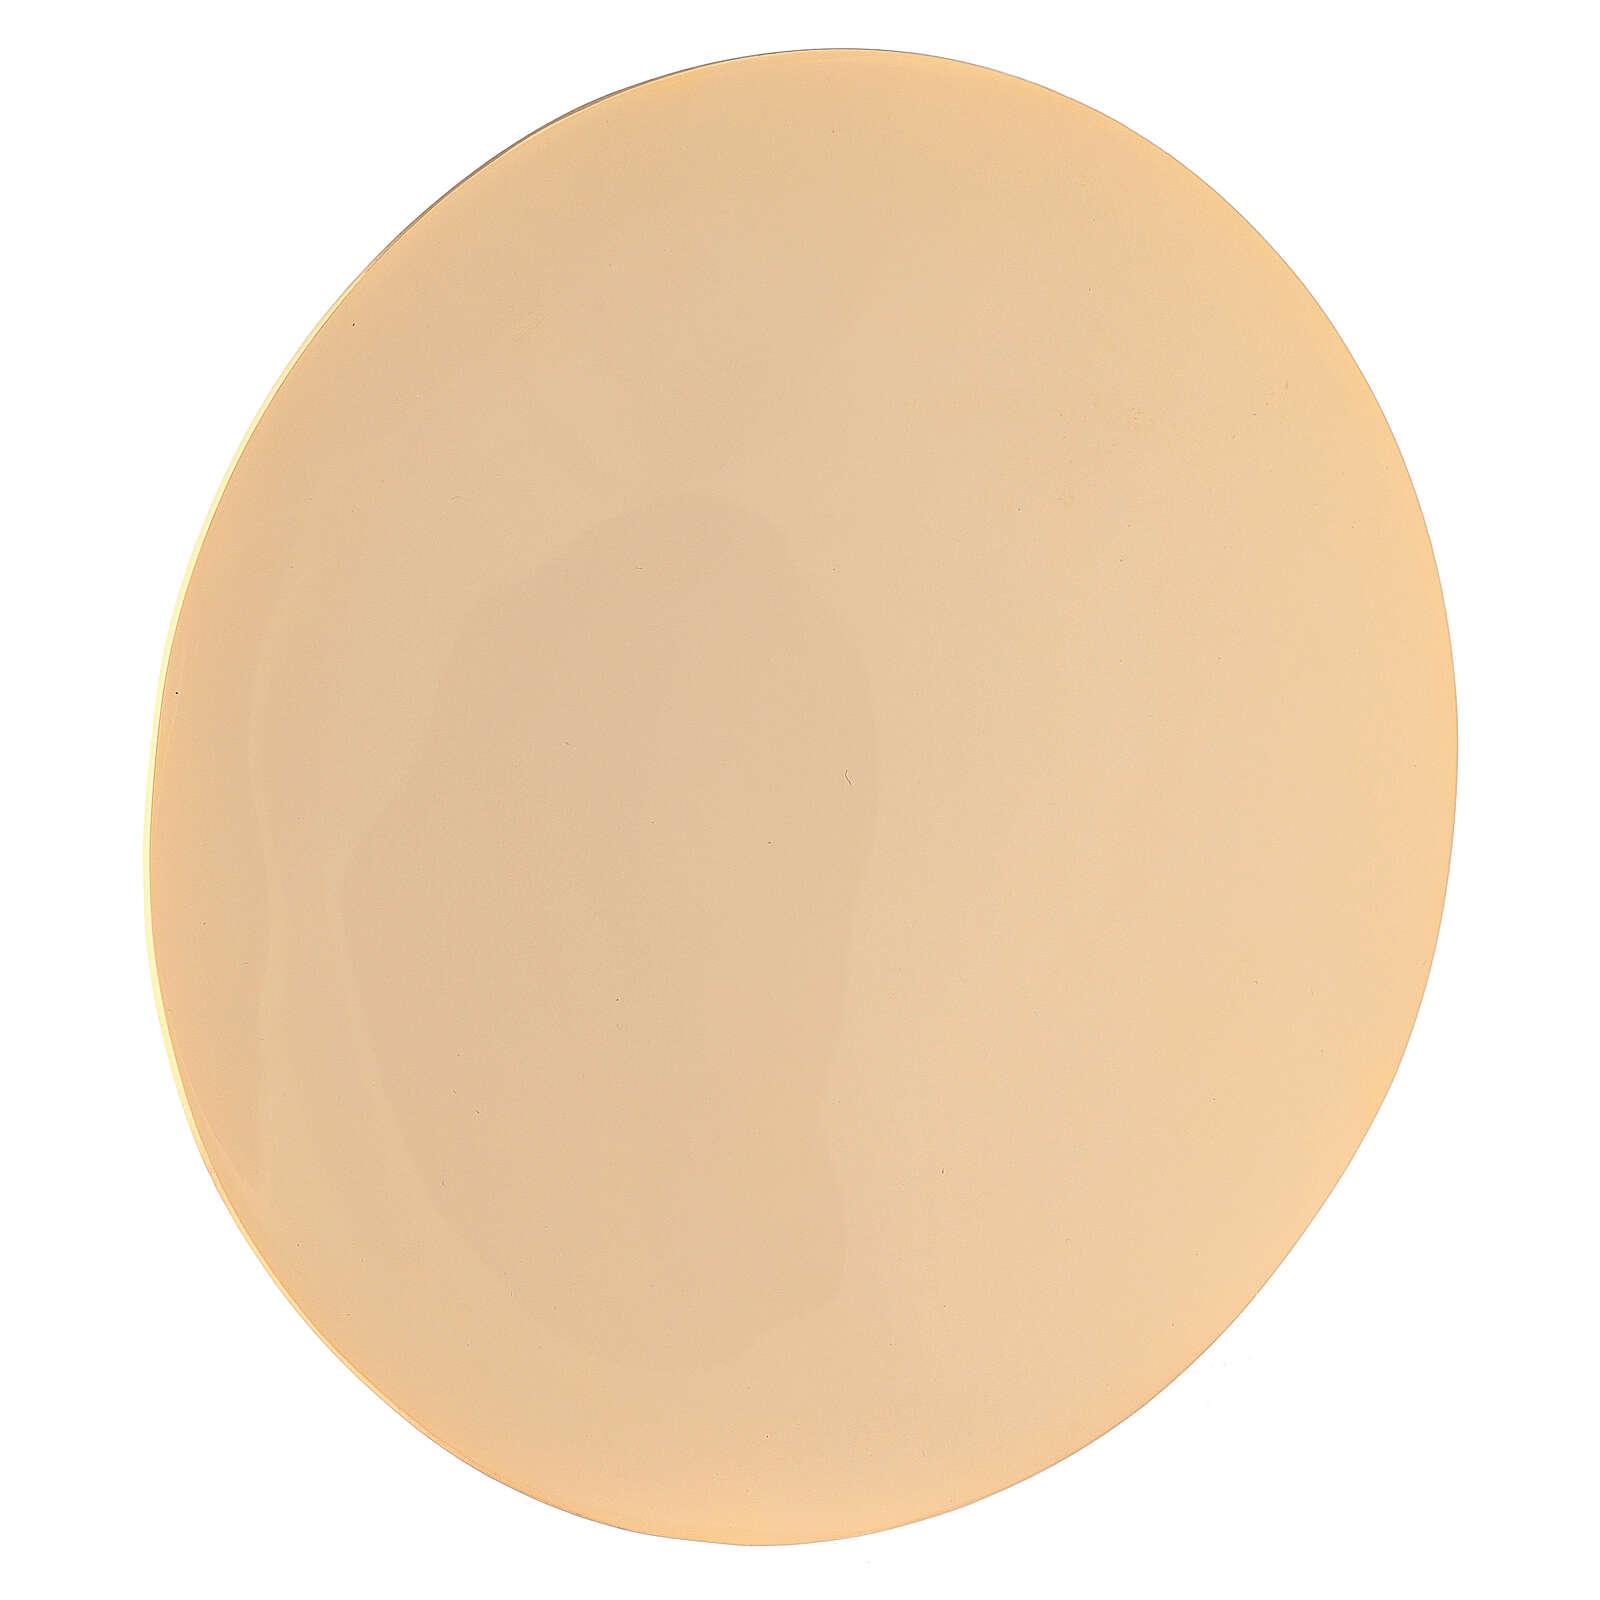 Paten in gold-plated brass diameter 16 cm 4